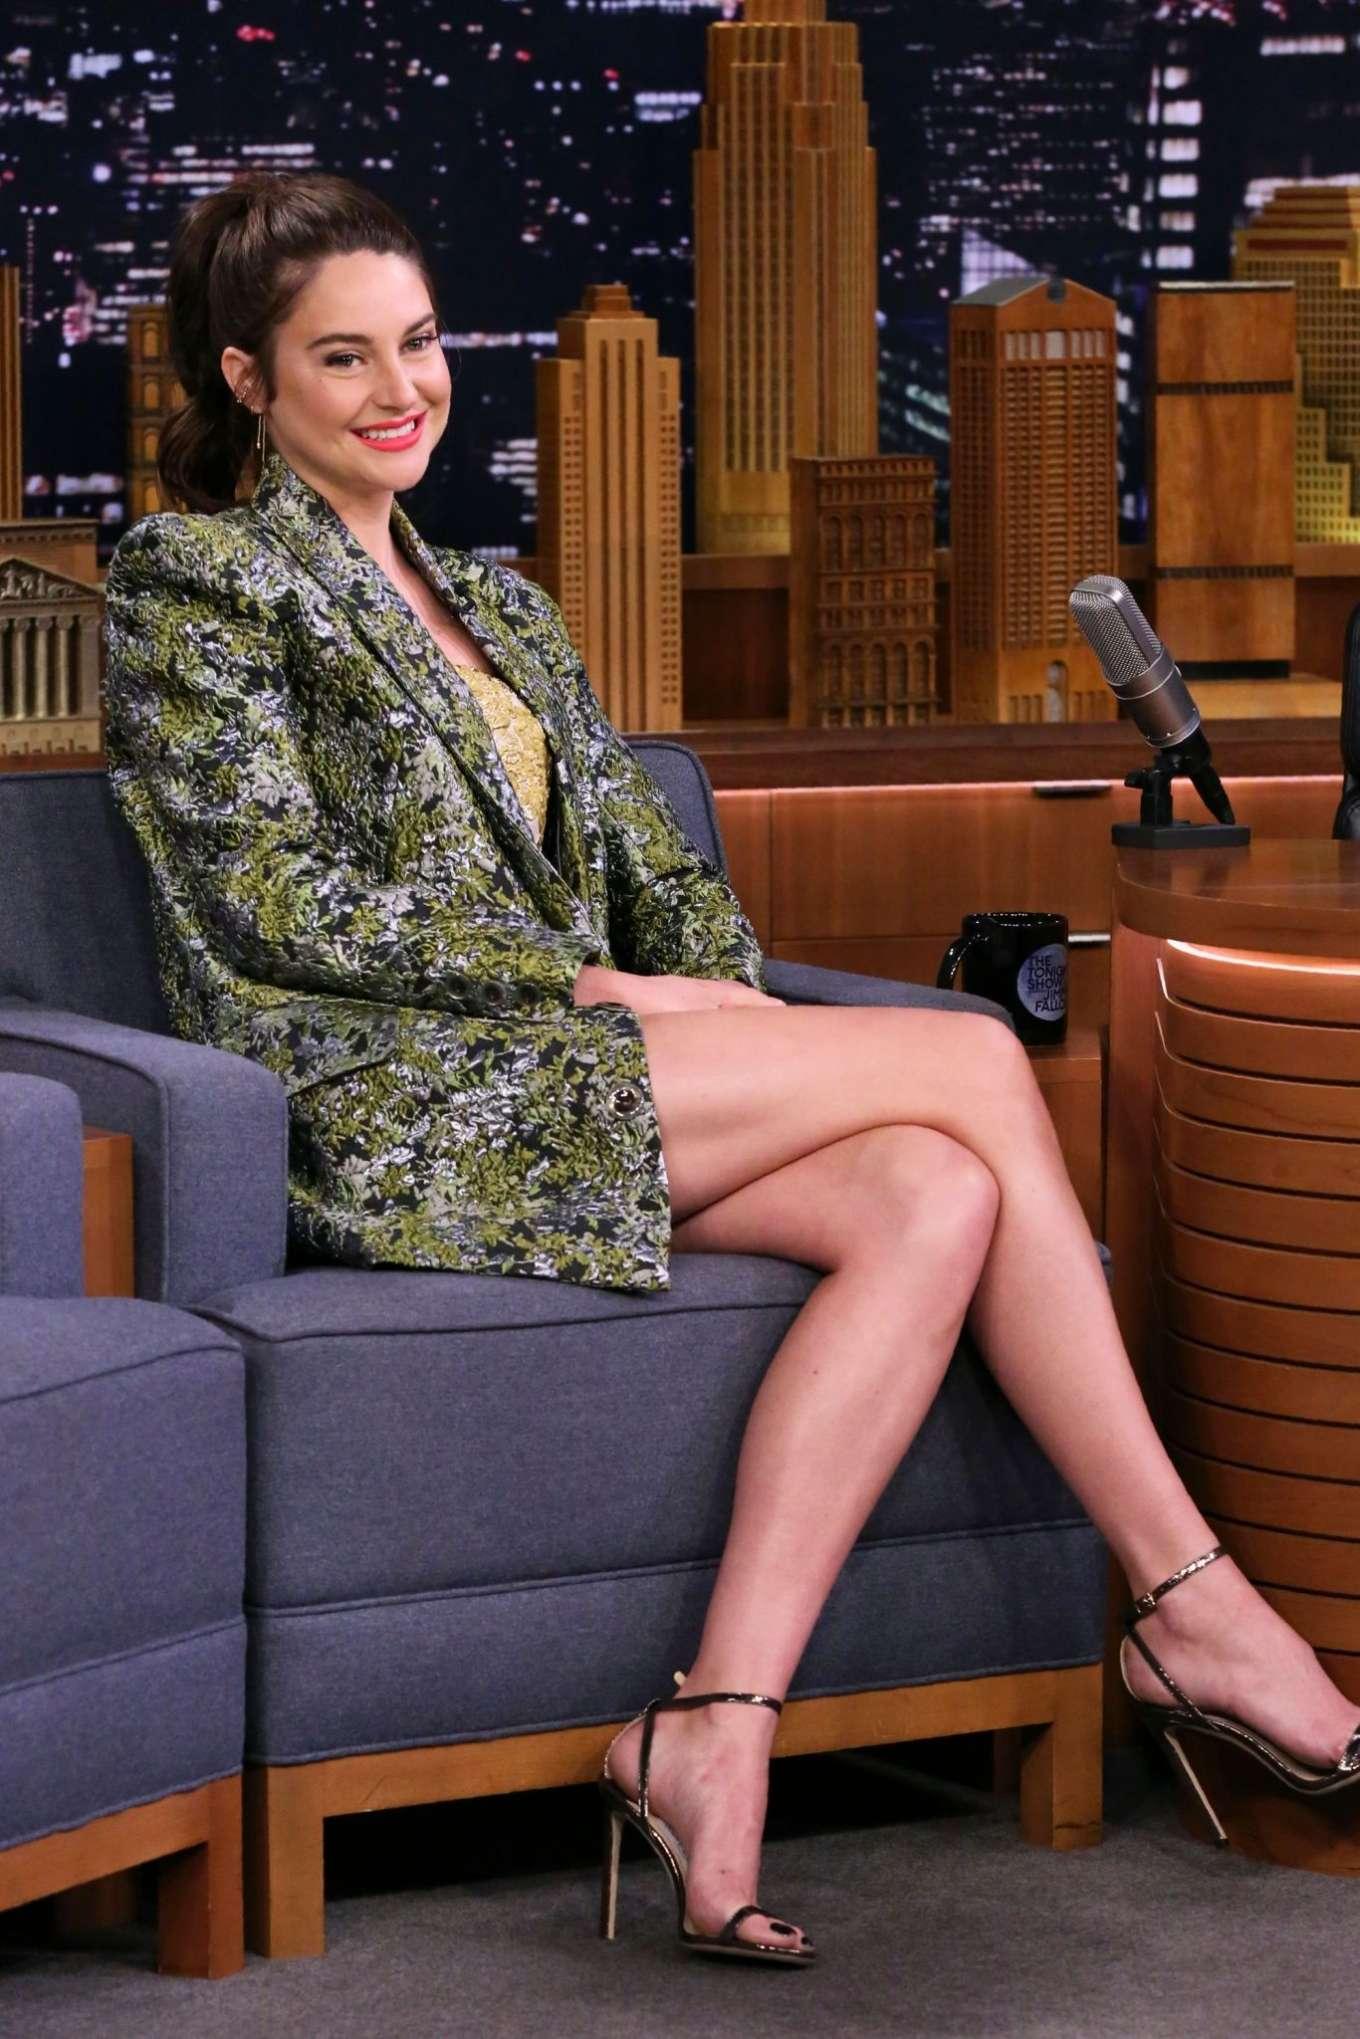 Shailene Woodley 2019 : Shailene Woodley: On The Tonight Show Starring Jimmy Fallon-05